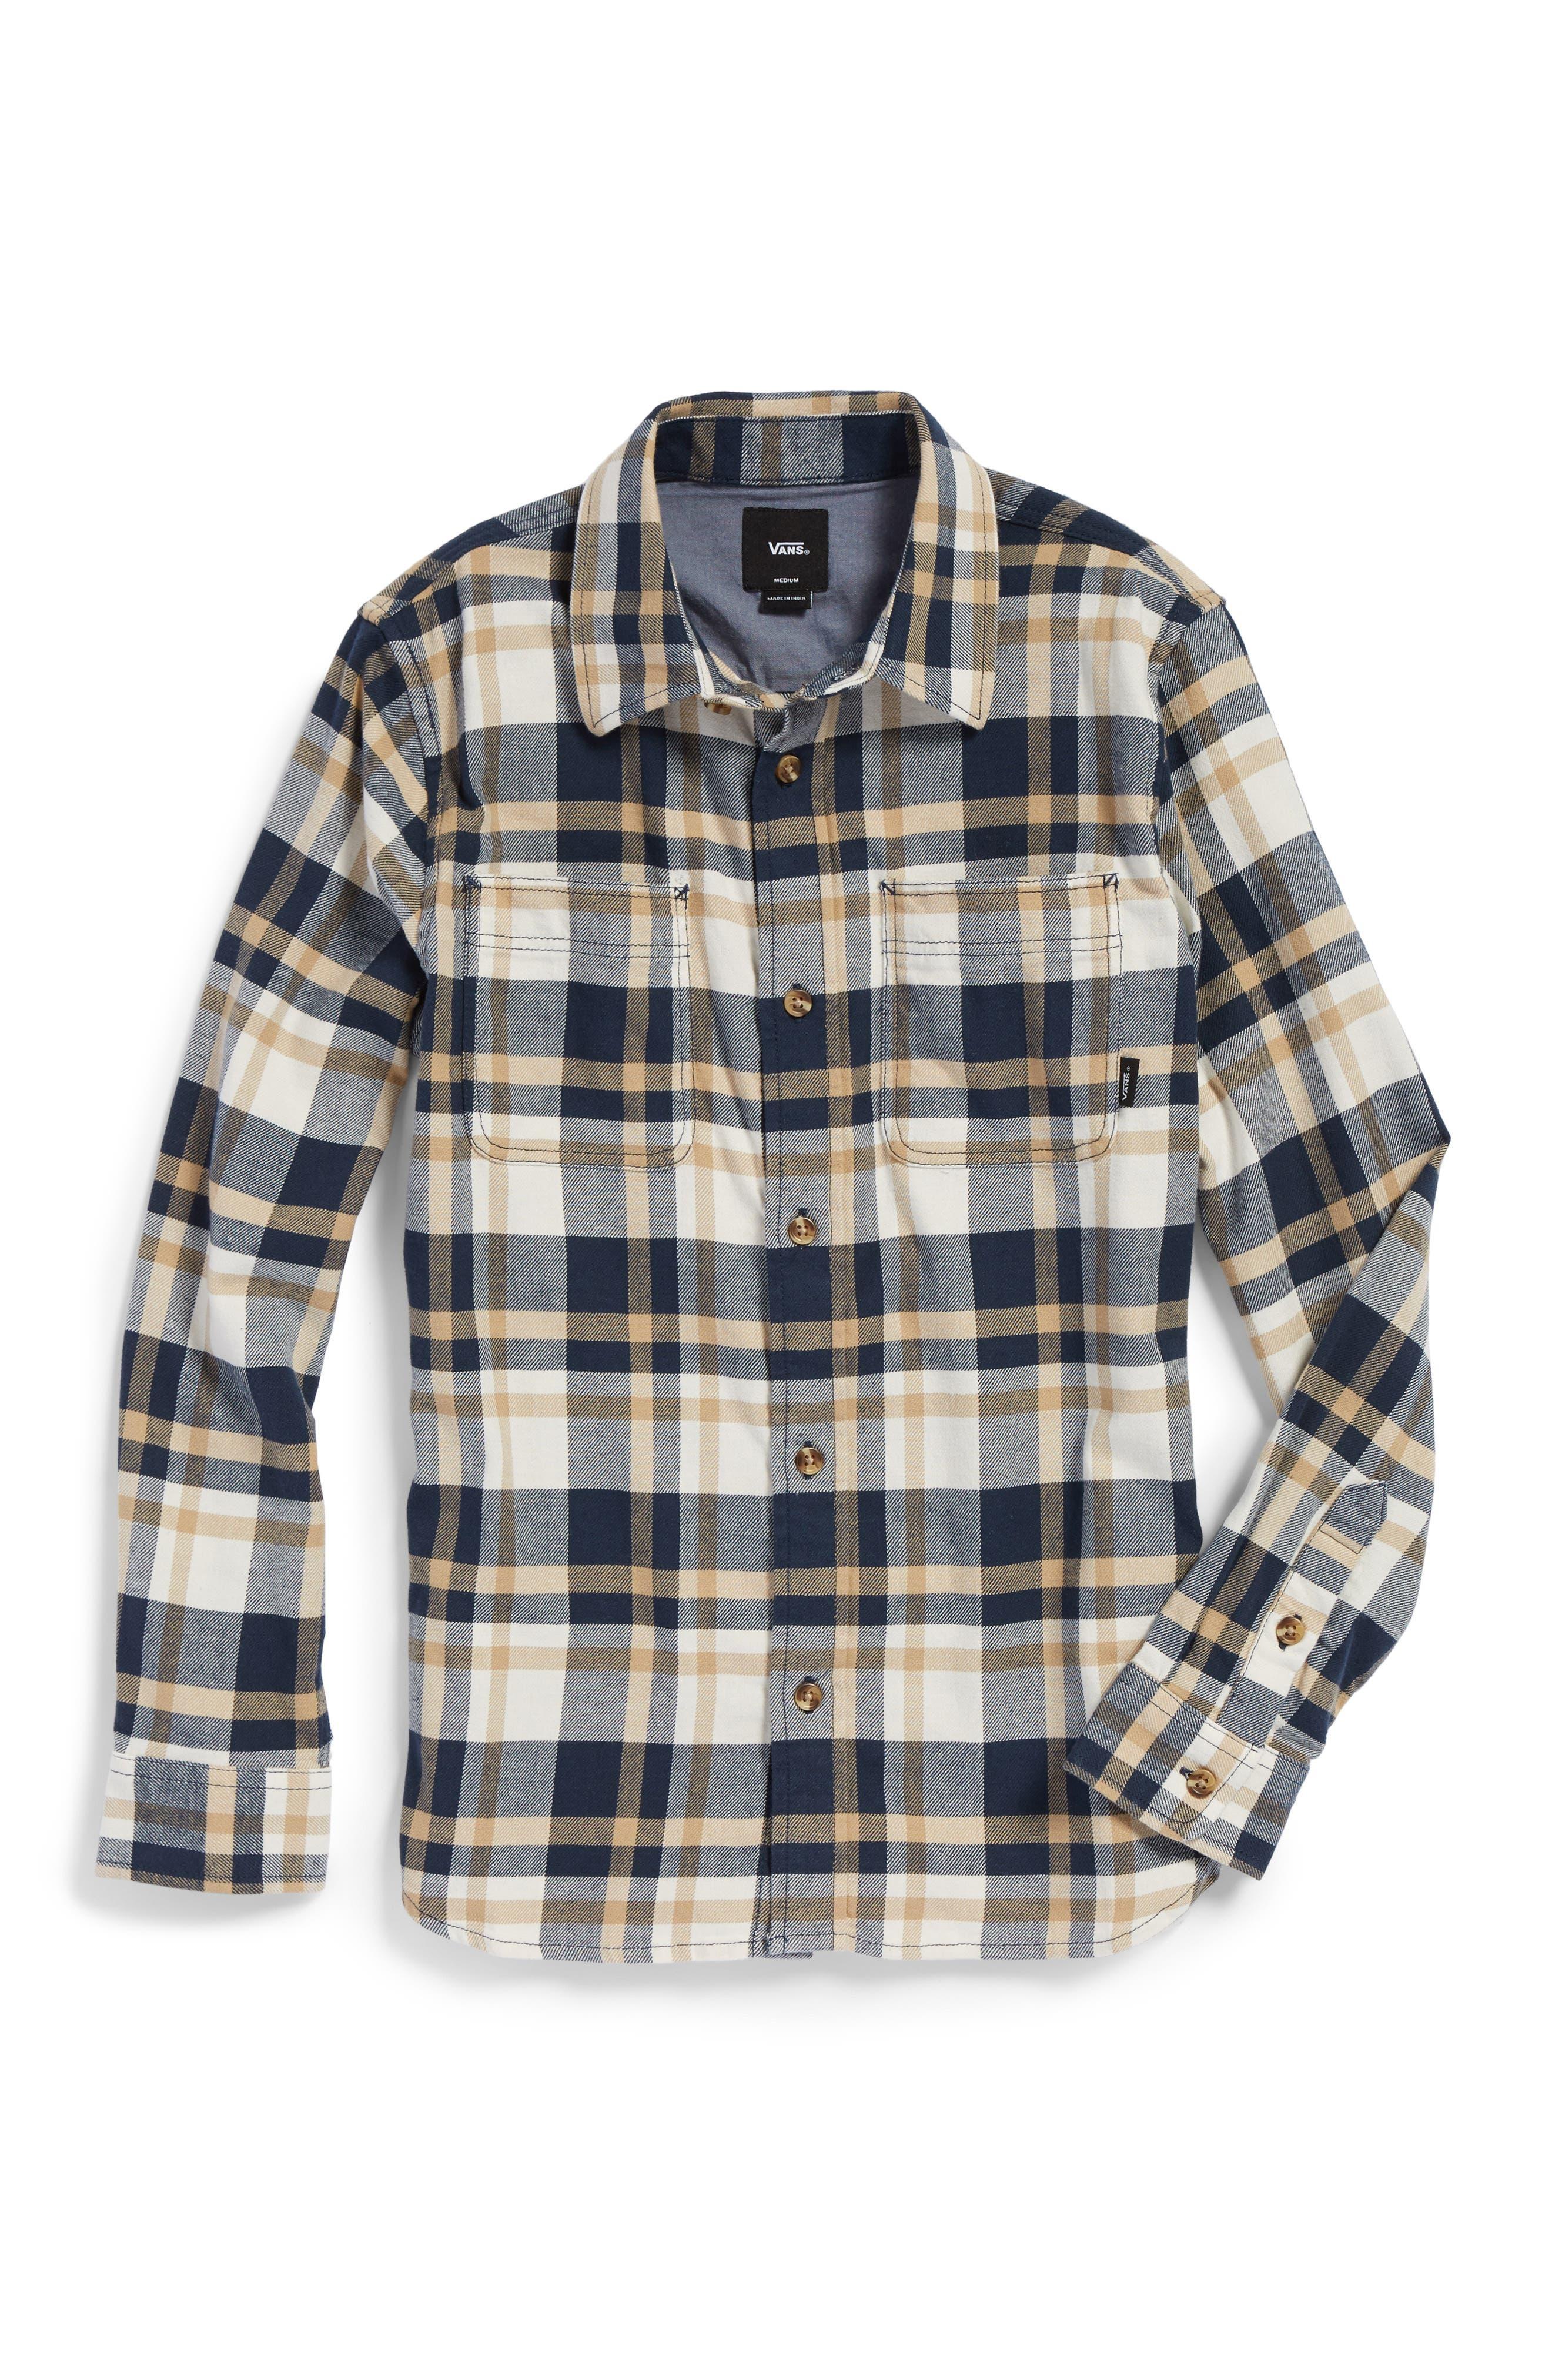 Main Image - Vans Banfield Plaid Flannel Shirt (Big Boys)